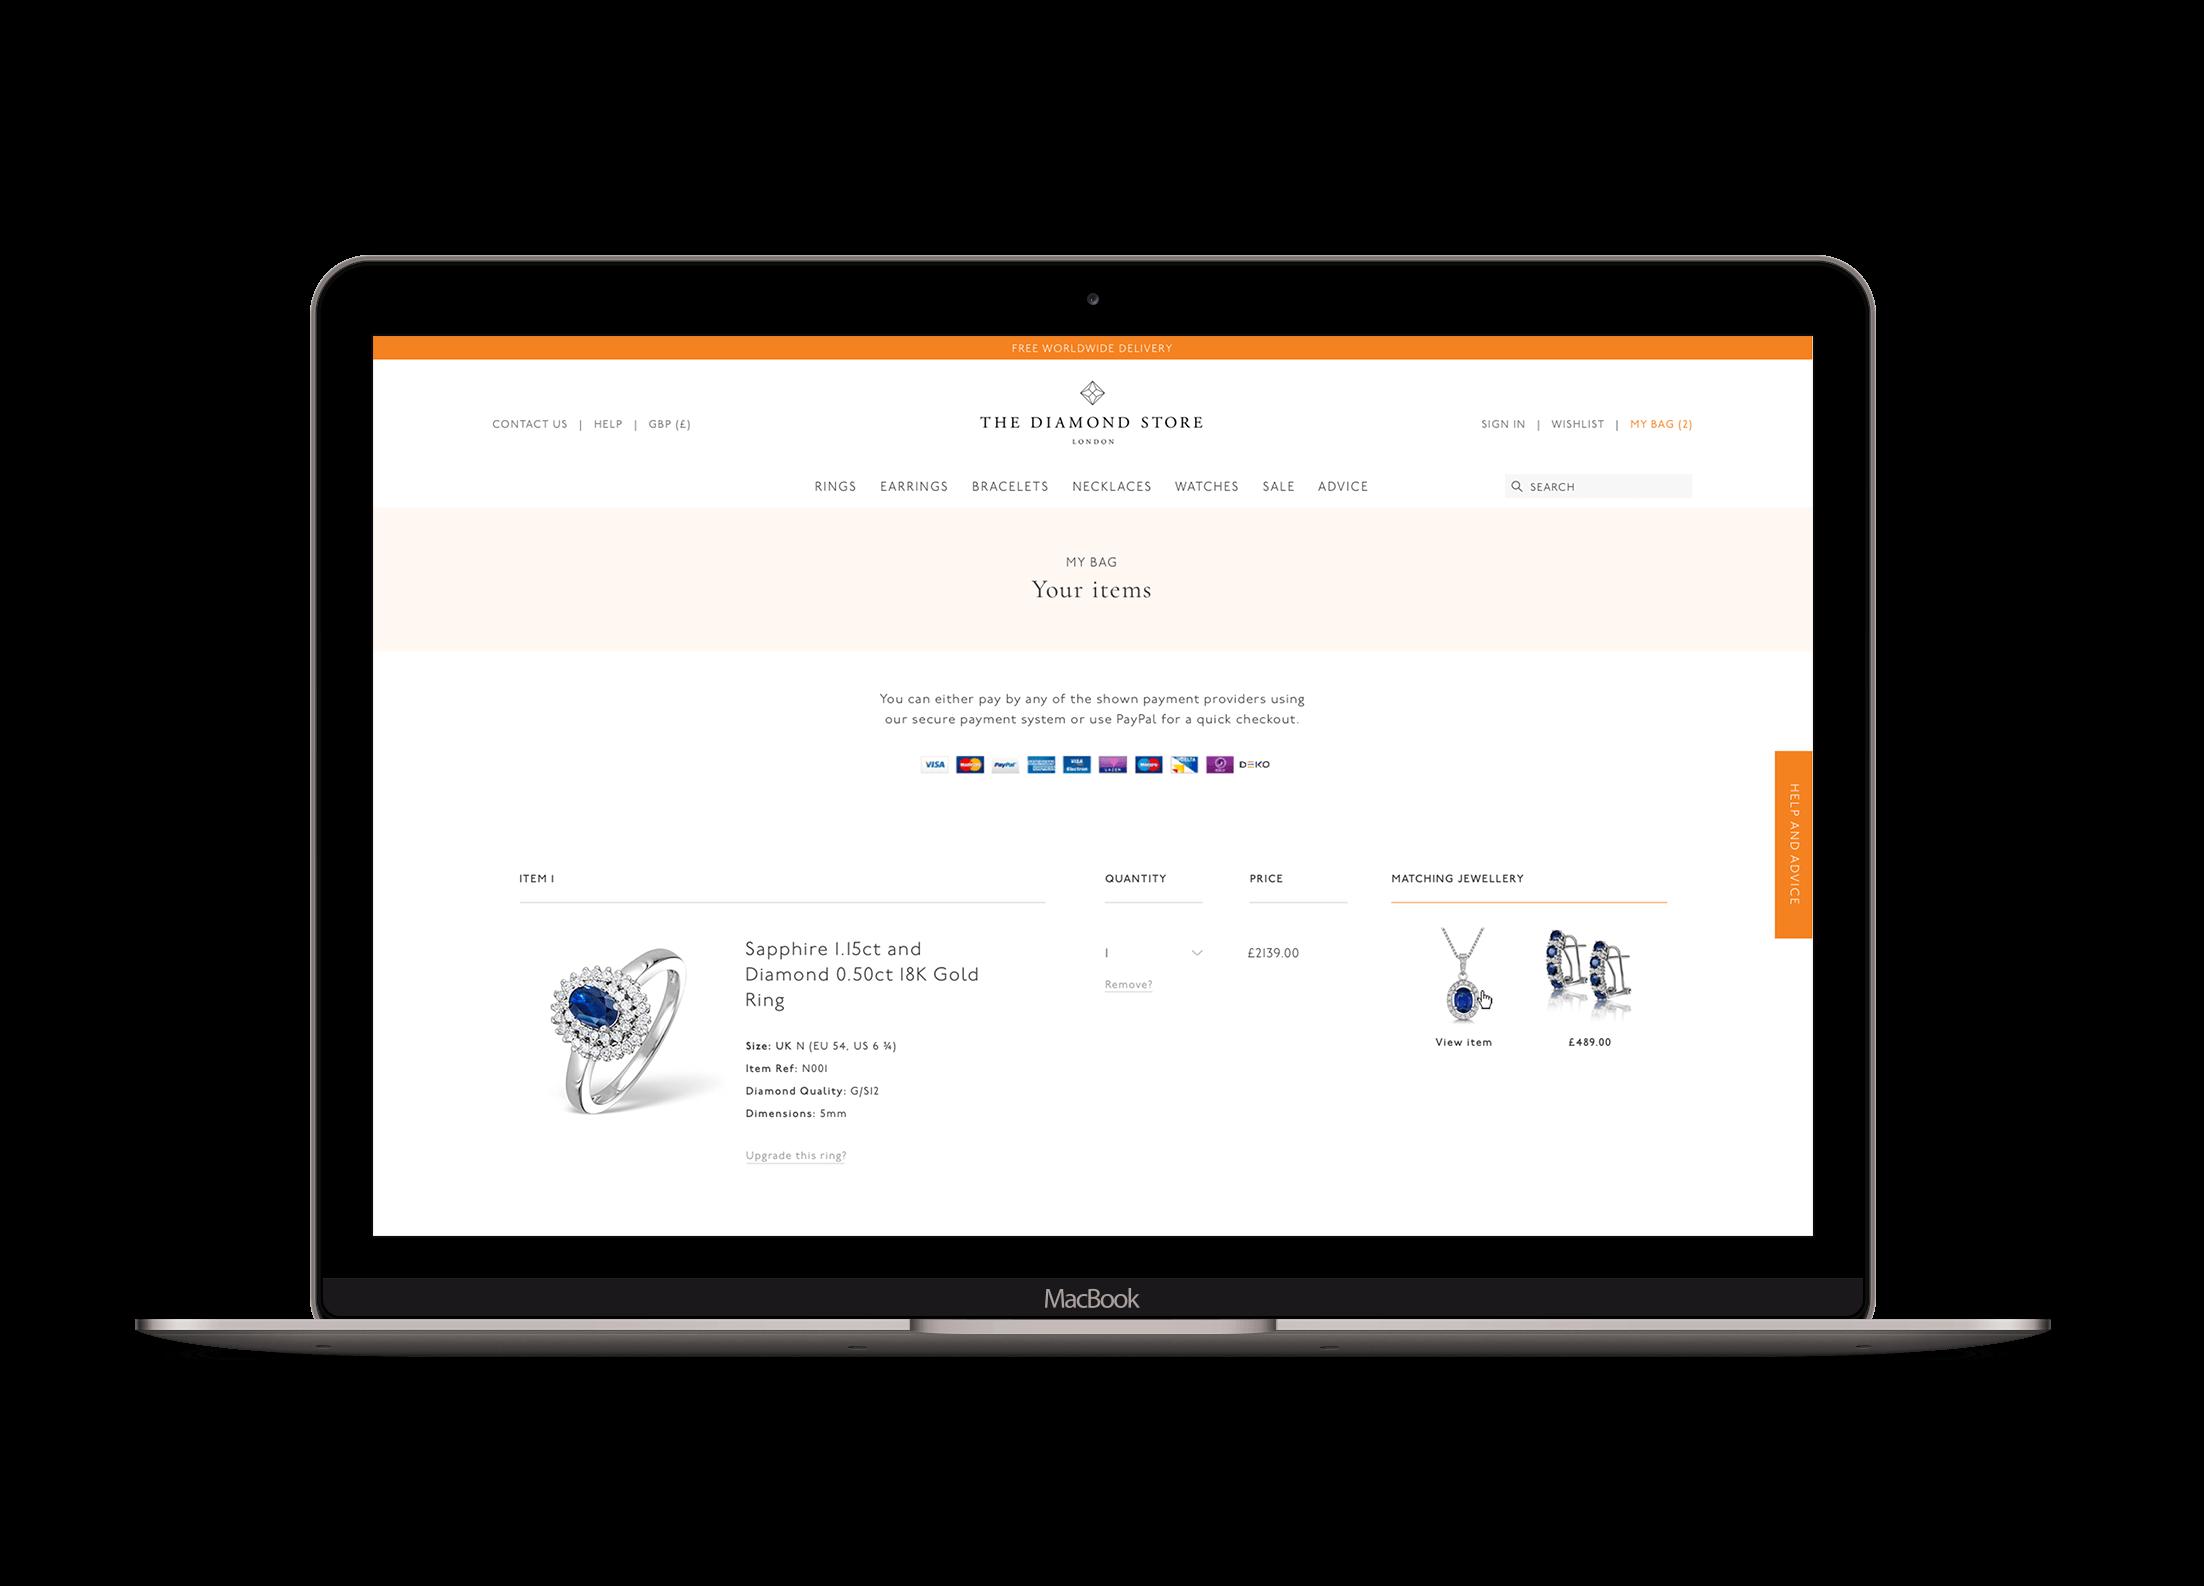 Chânelle-Sharp-Digital-Portfolio-The-Diamond-Store-Macbook-11